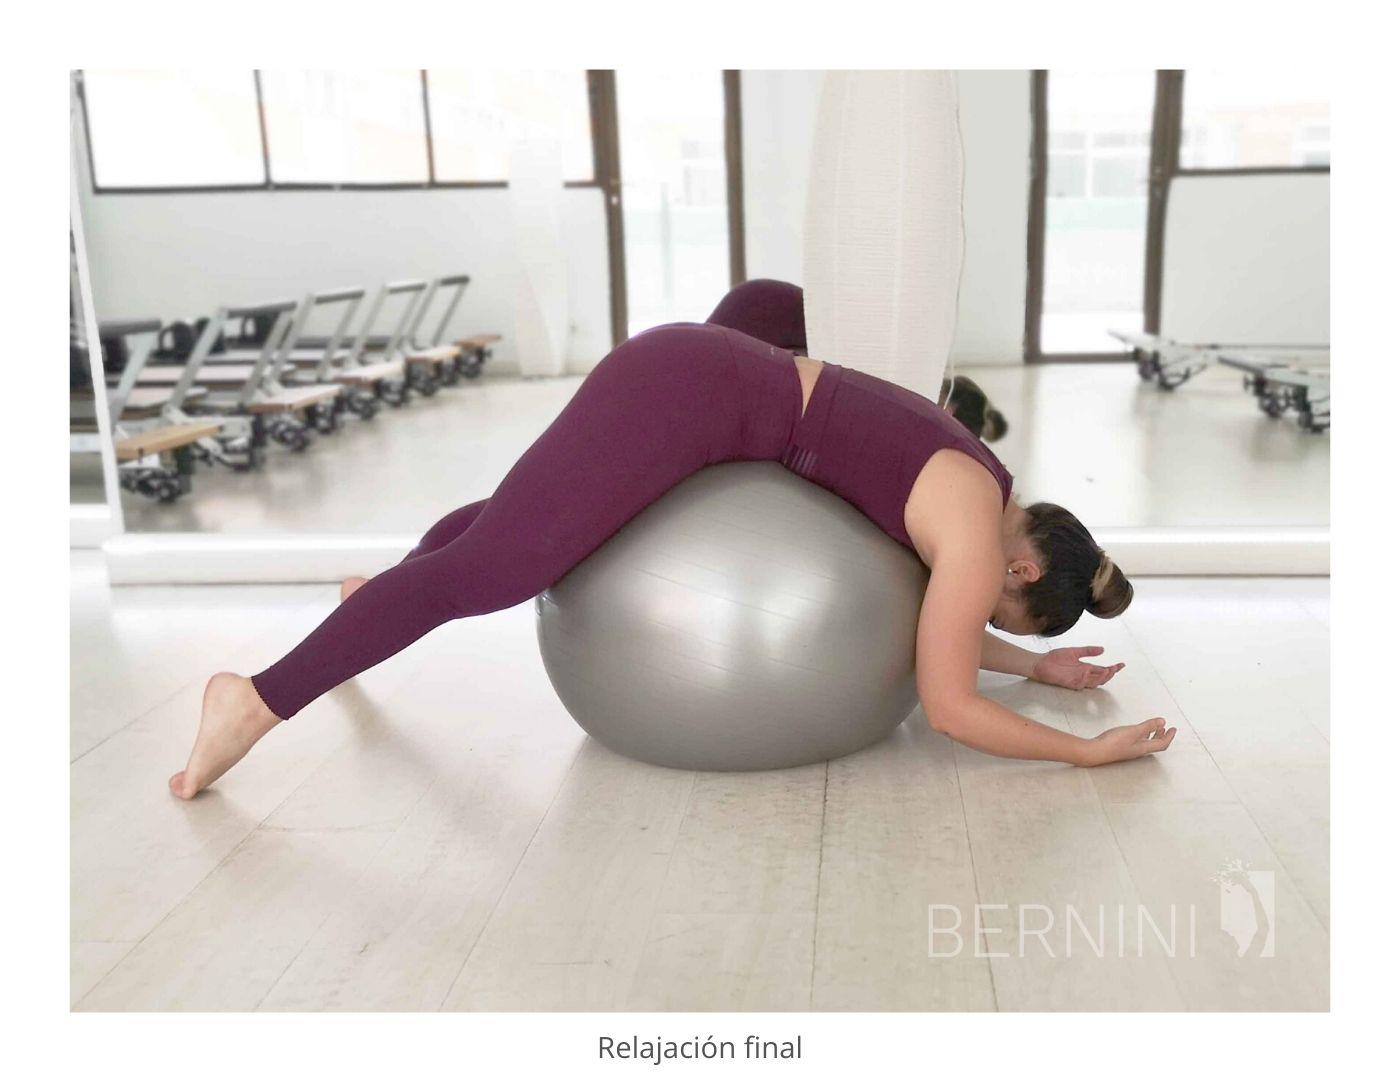 relajación fitball pilates mat bernini wellness